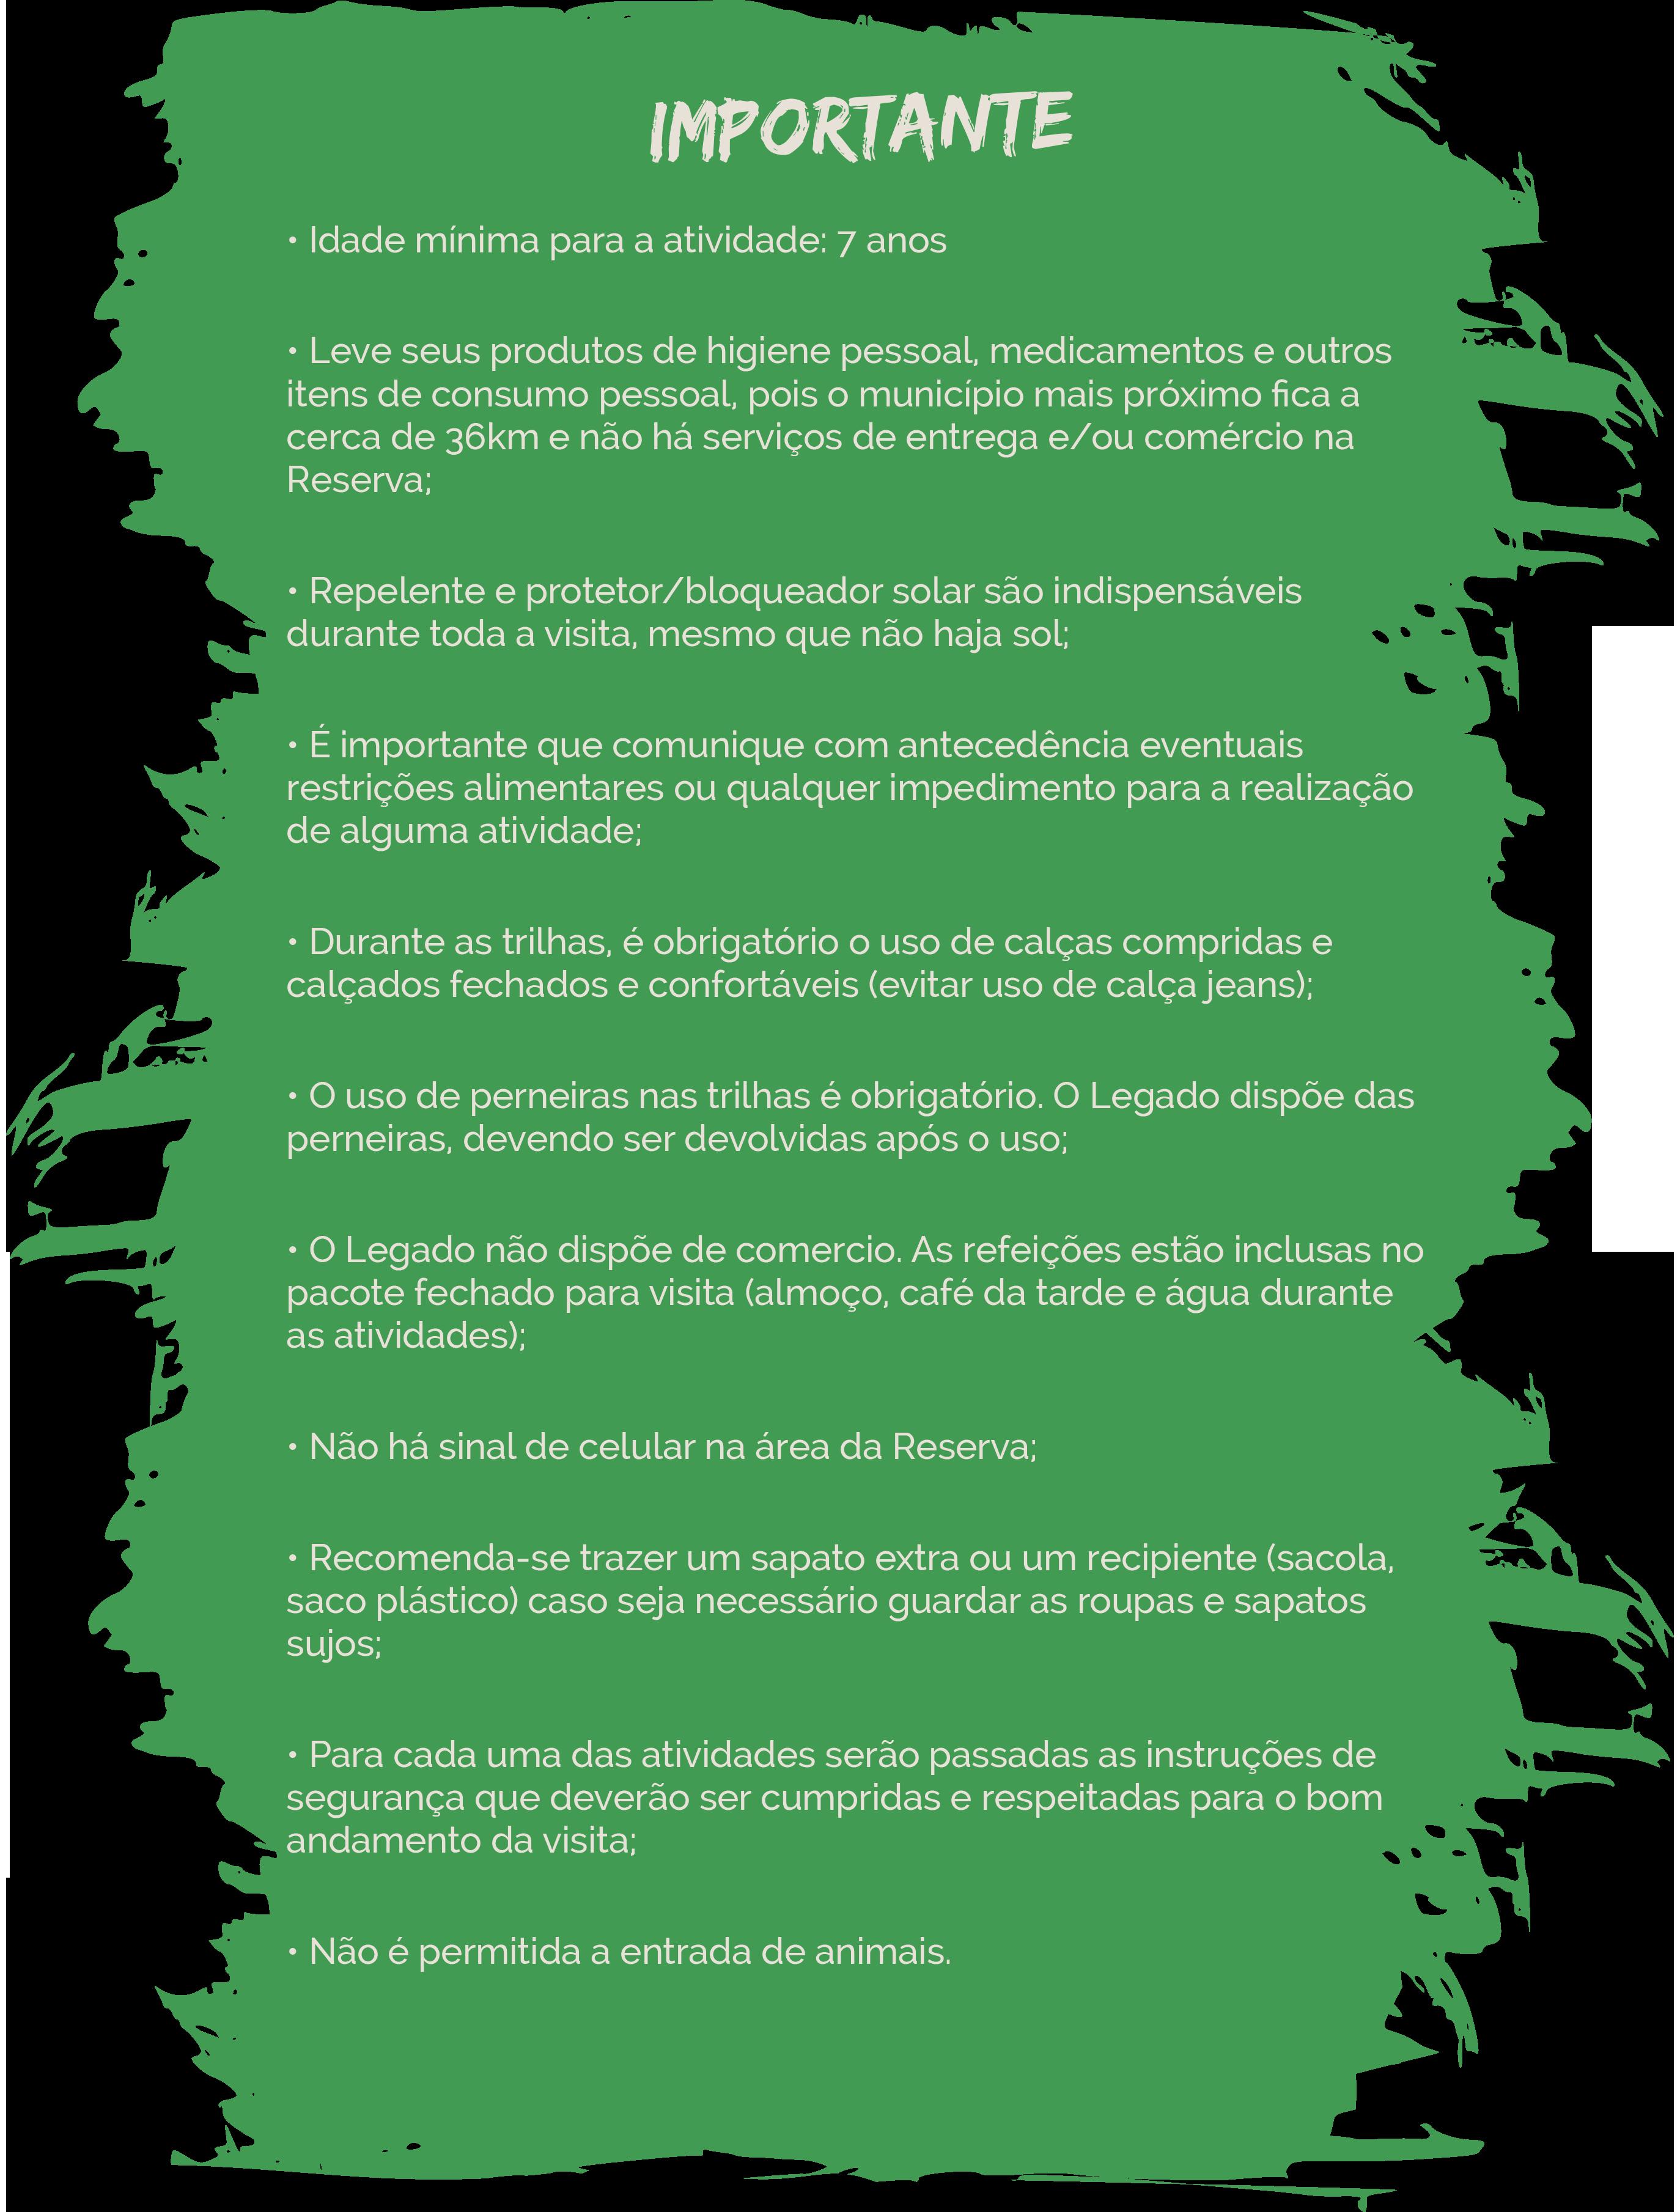 imporante-trilhacopaibamirantesinal